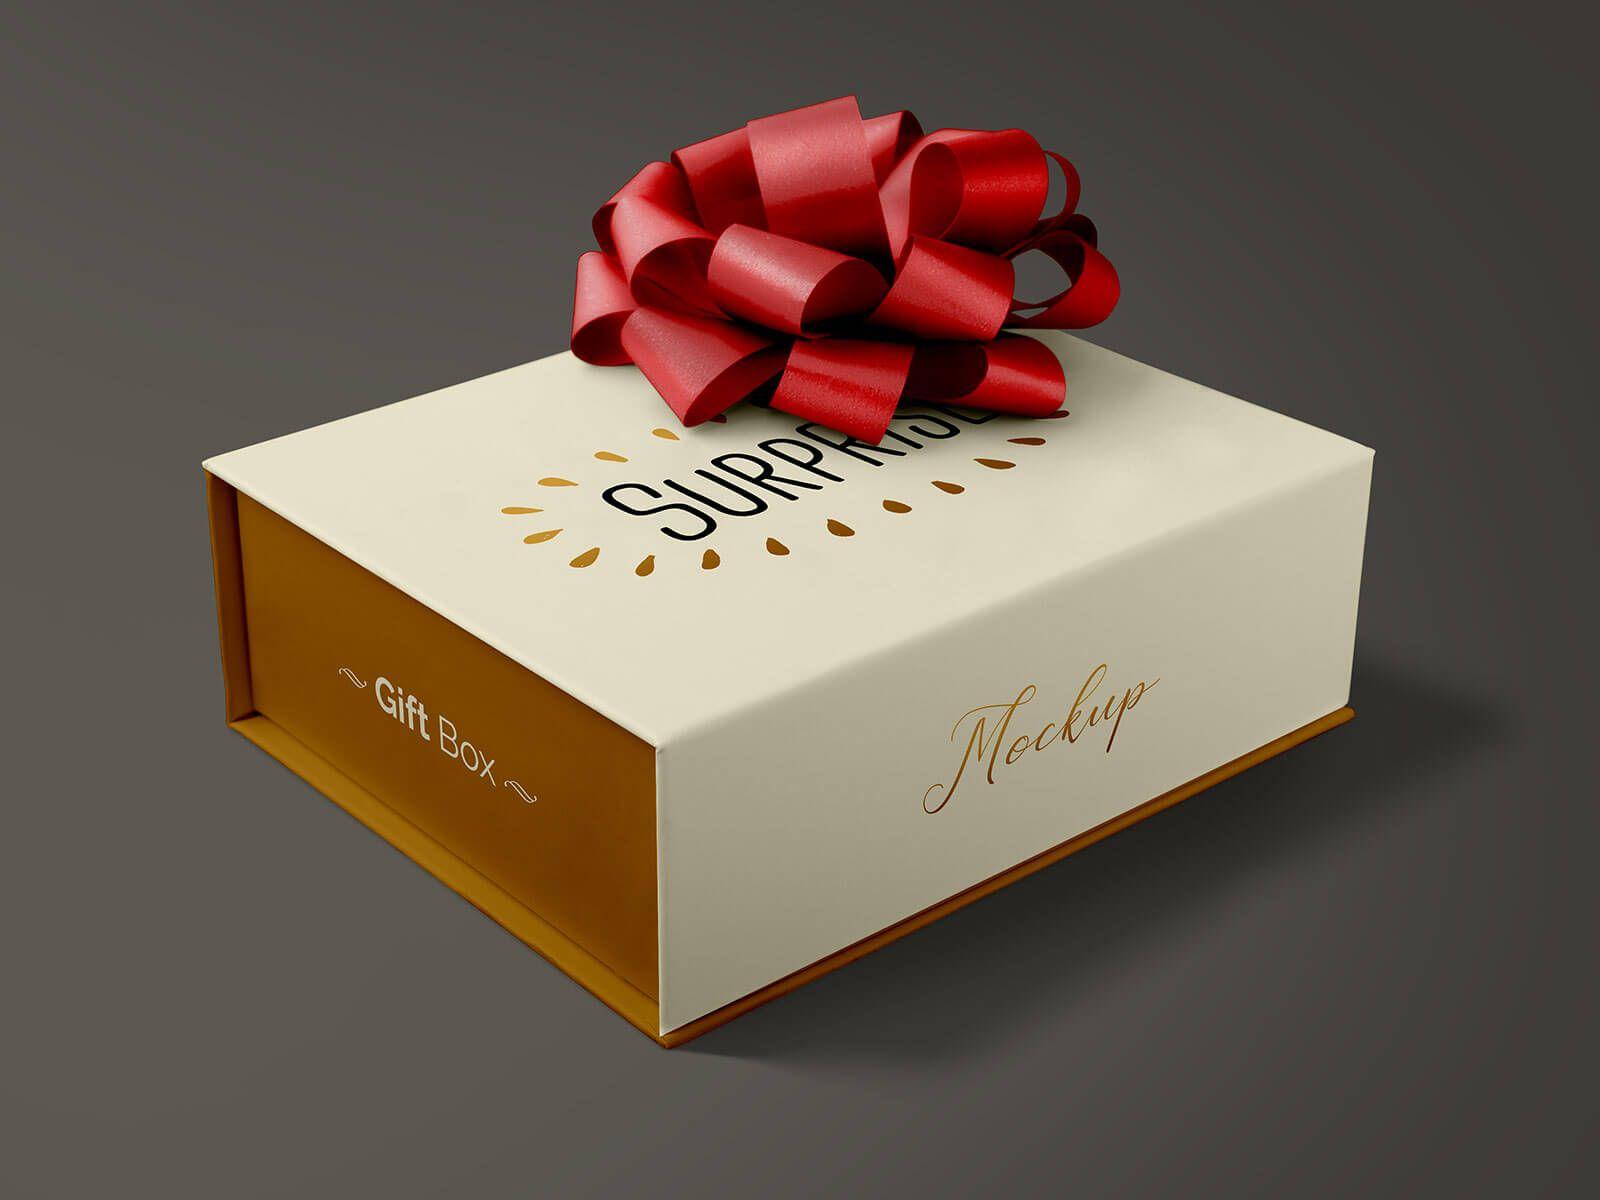 Download Free Gift Packaging Box Mockup Psd Good Mockups Box Mockup Box Packaging Gift Packaging